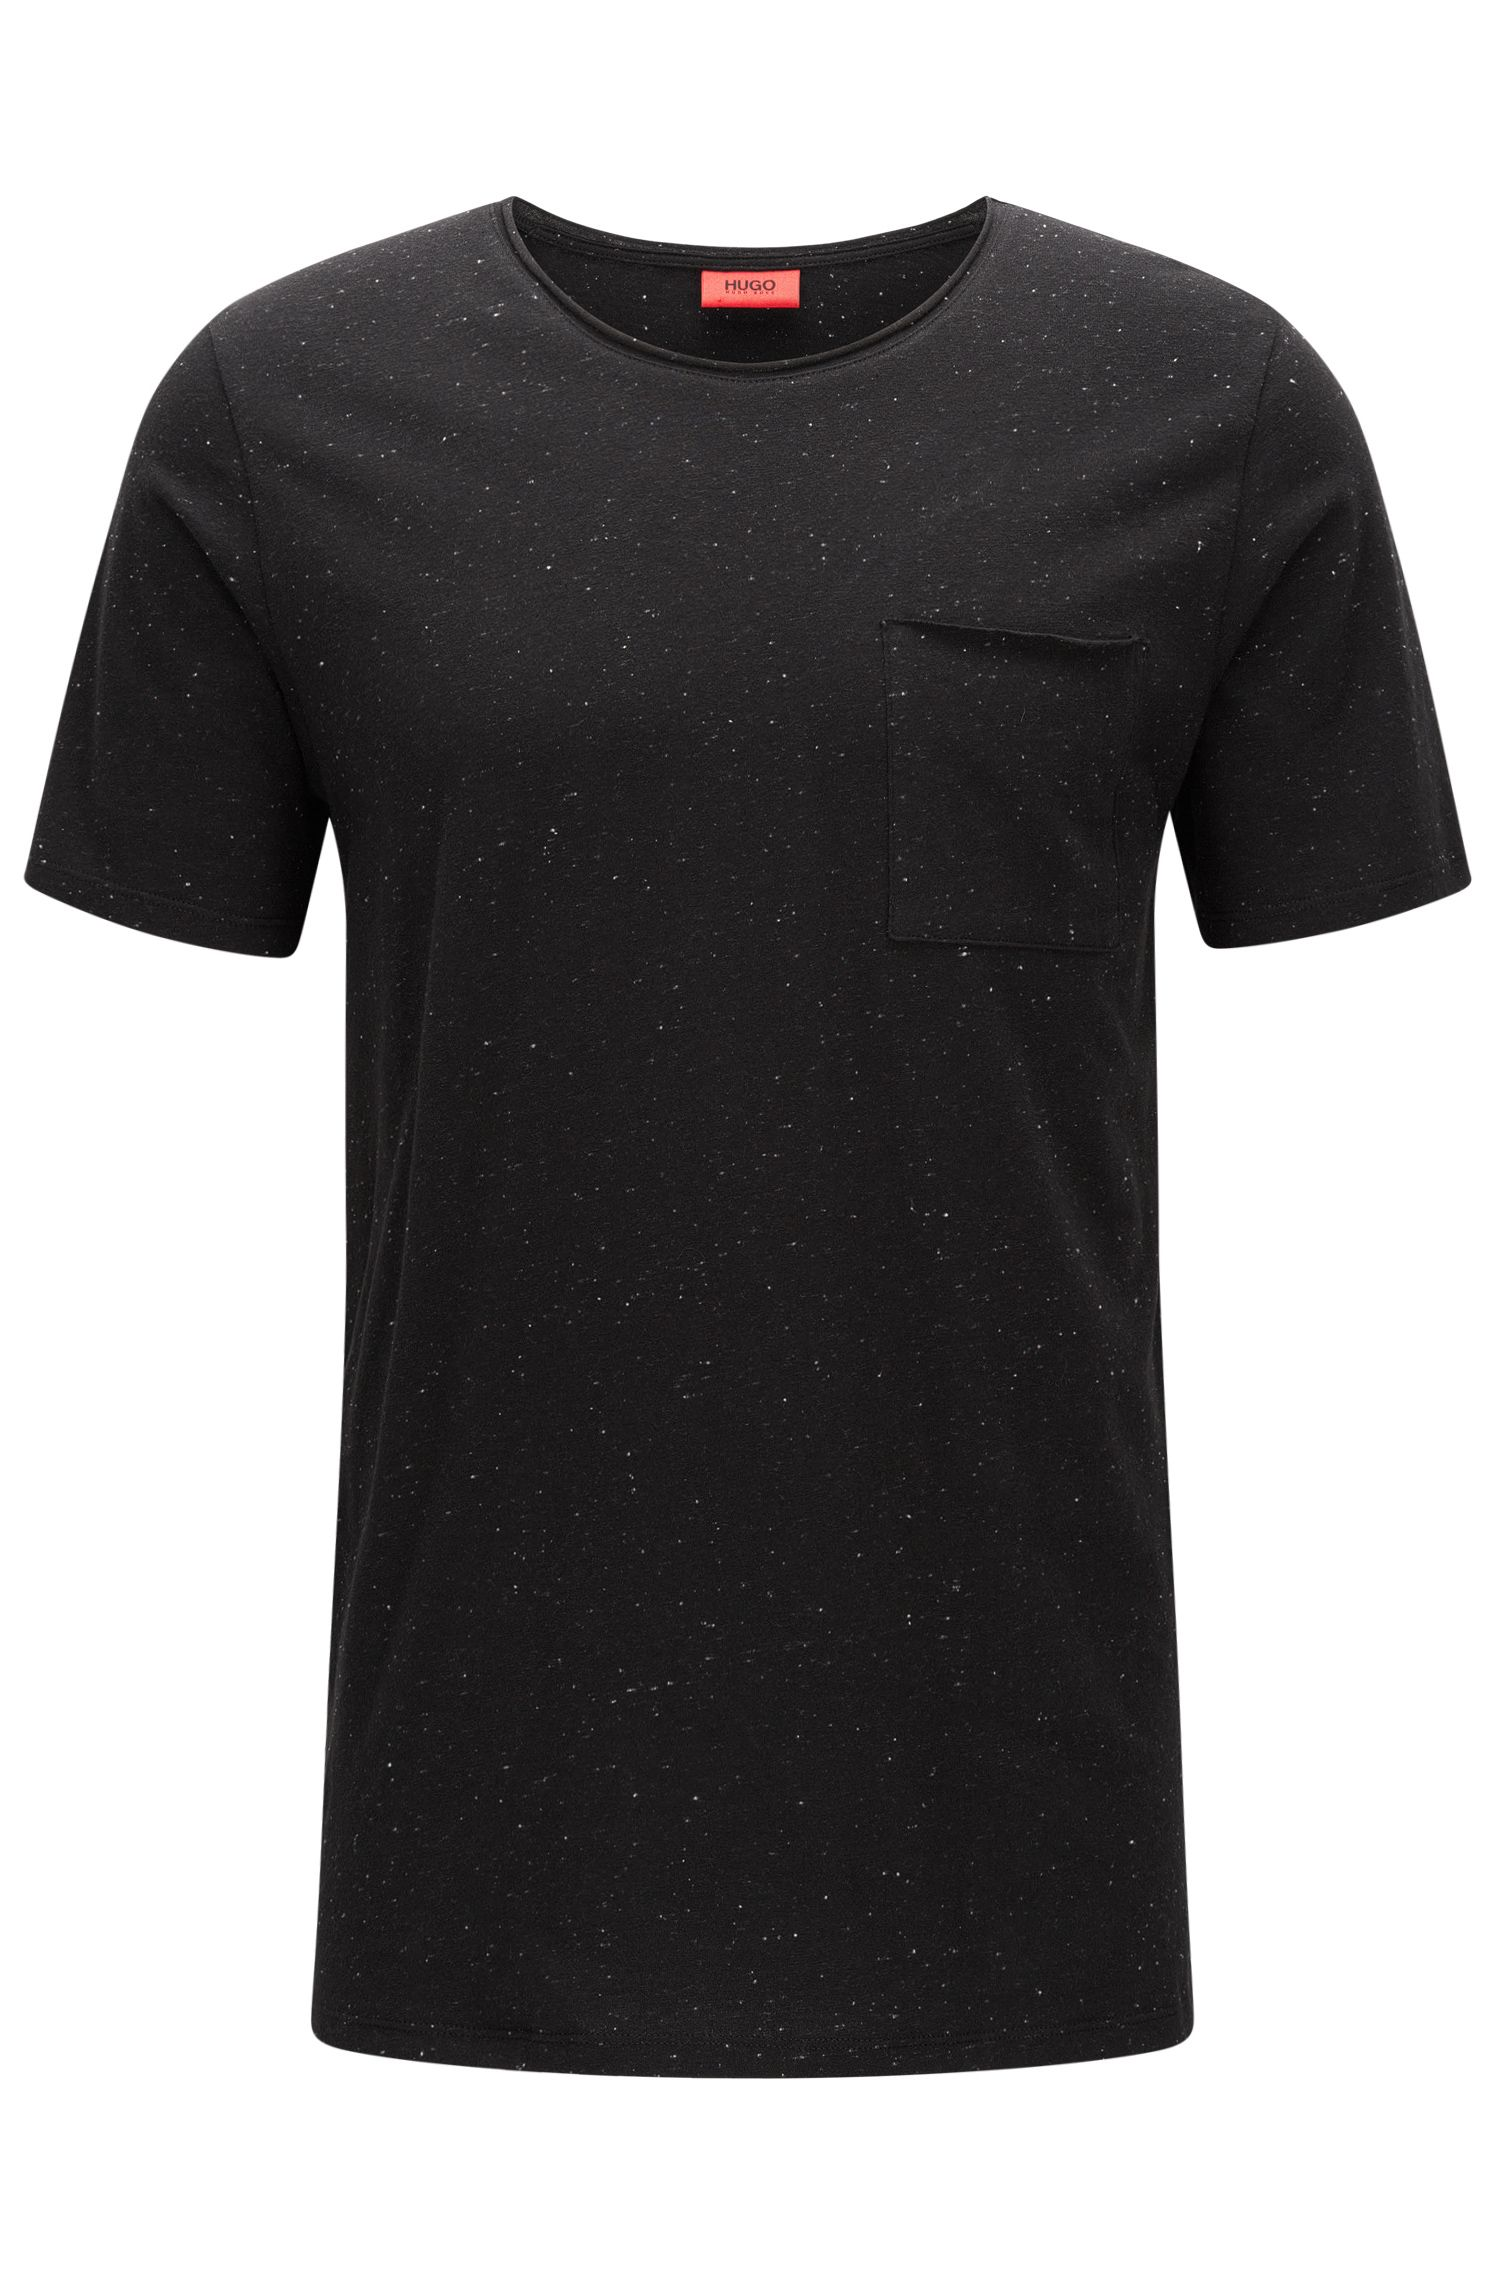 T-shirt Relaxed Fit en jersey chiné